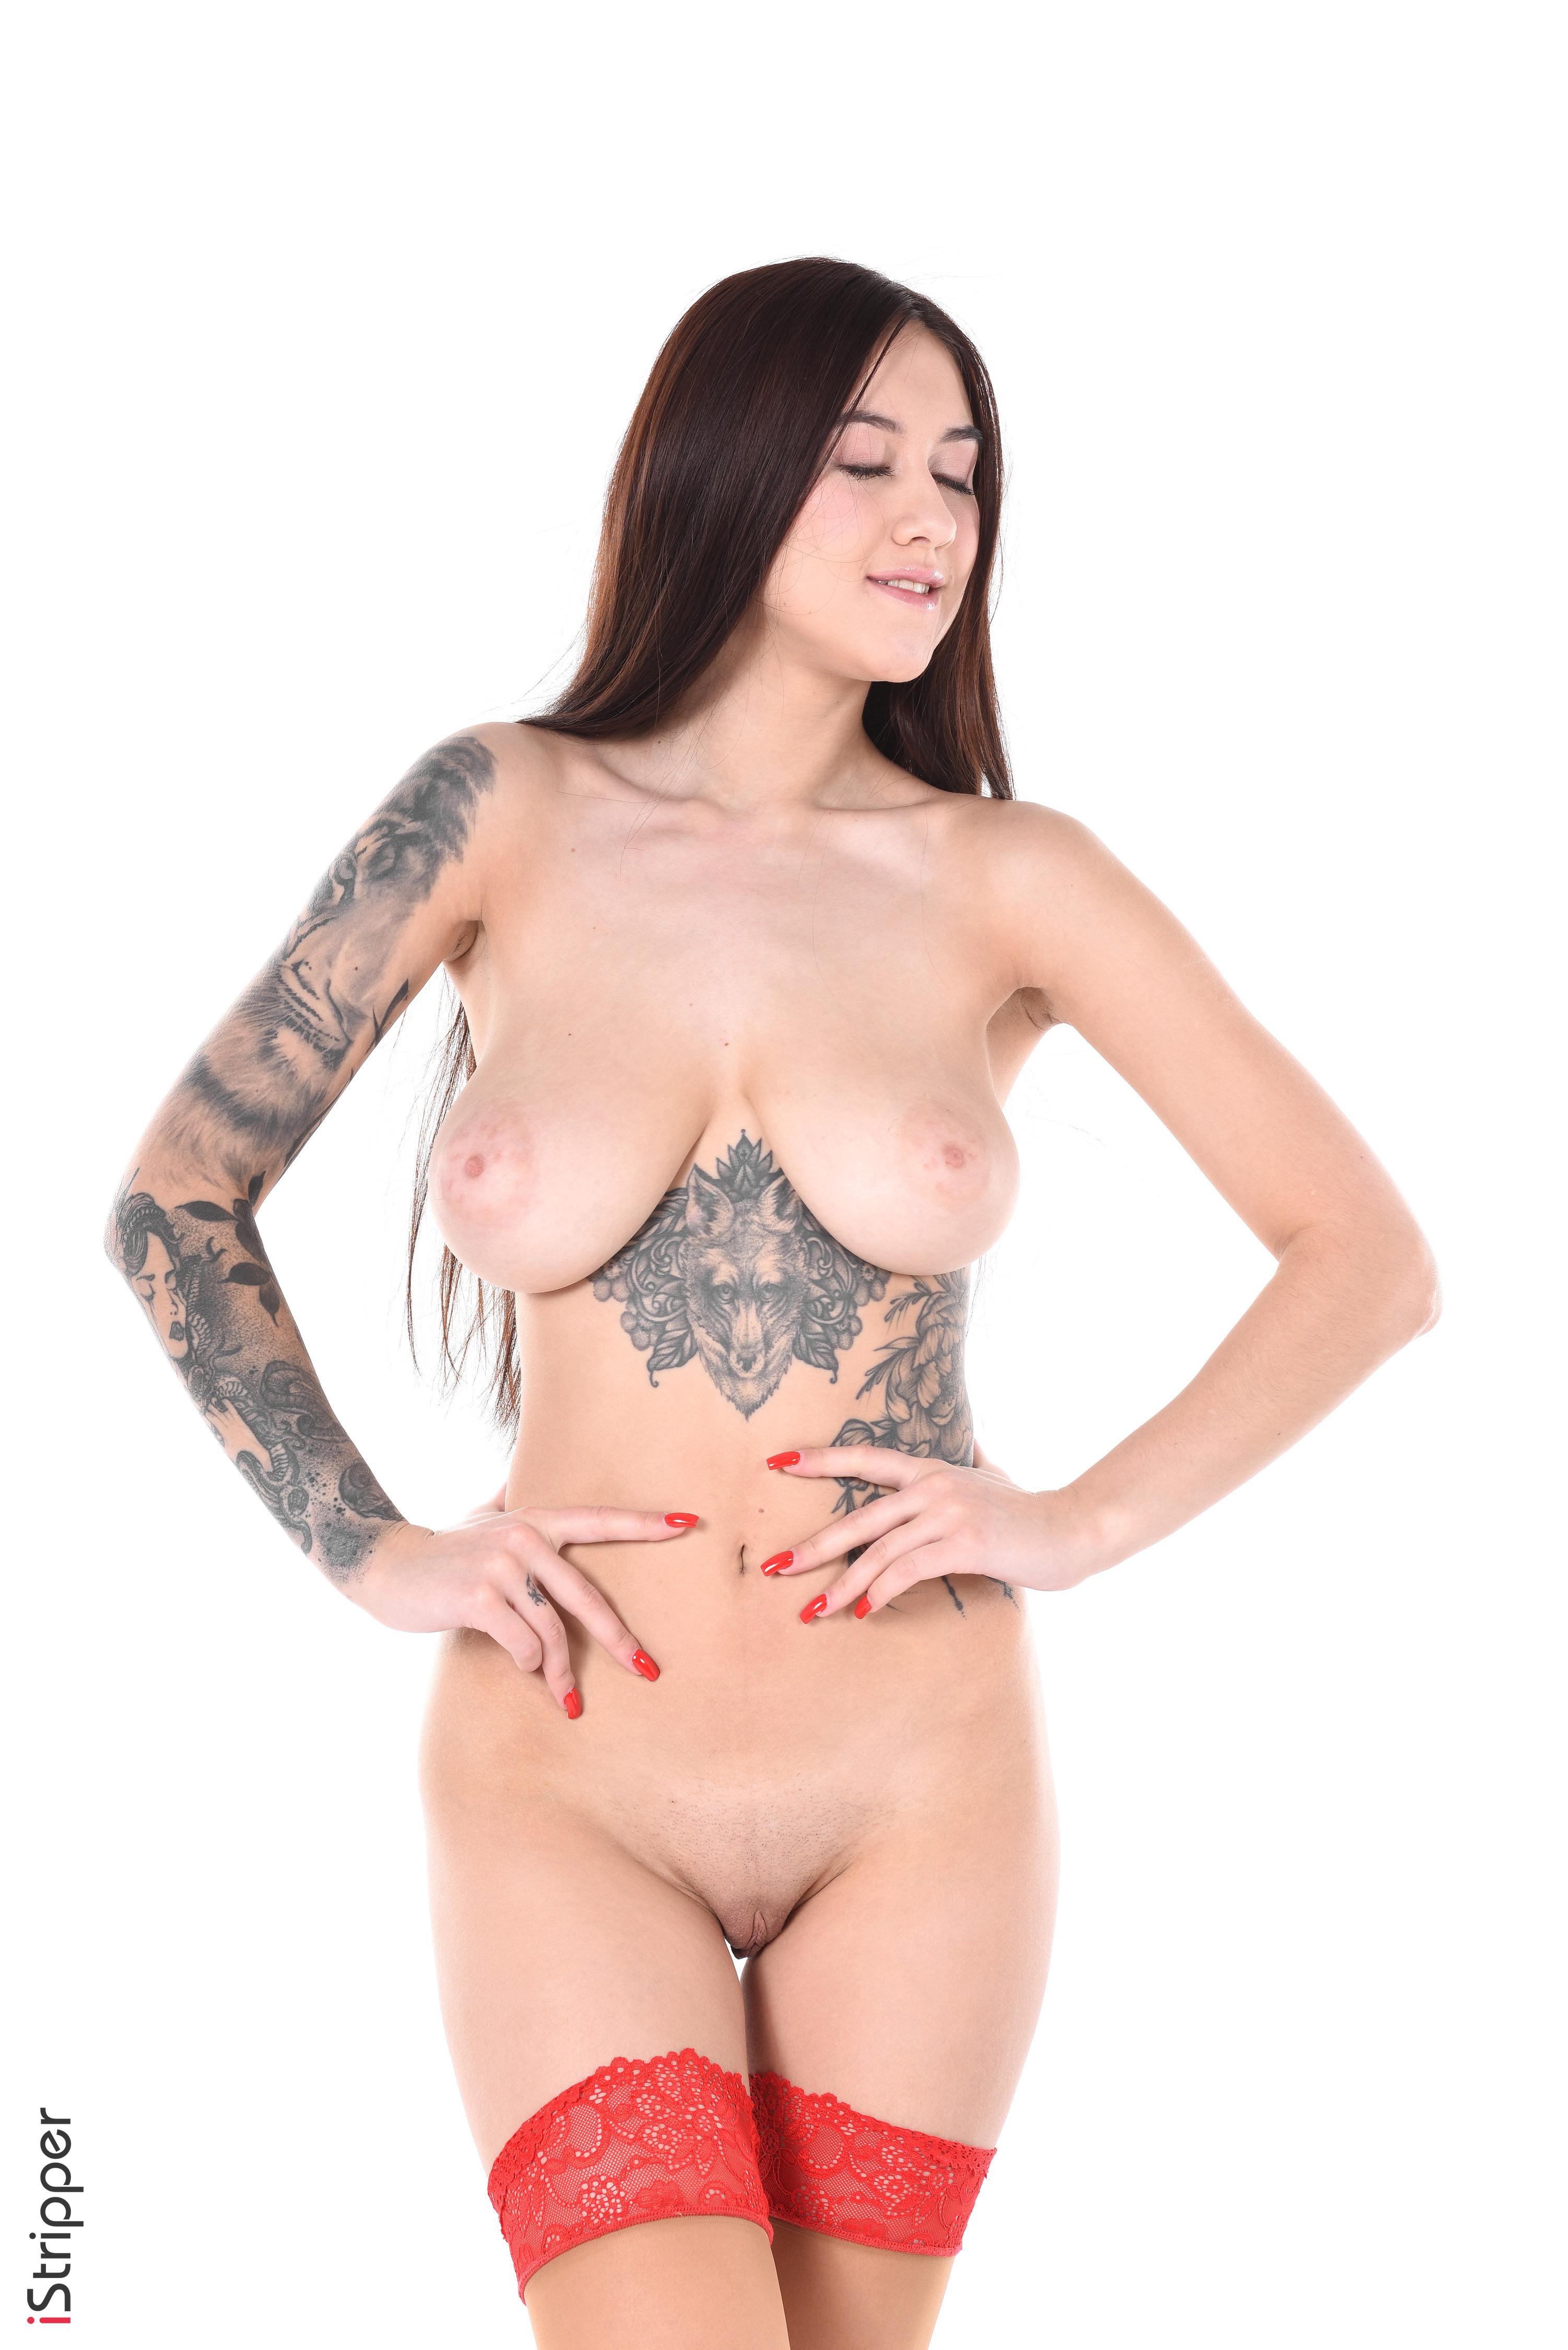 spankwire beautiful brunette performs sexy striptease